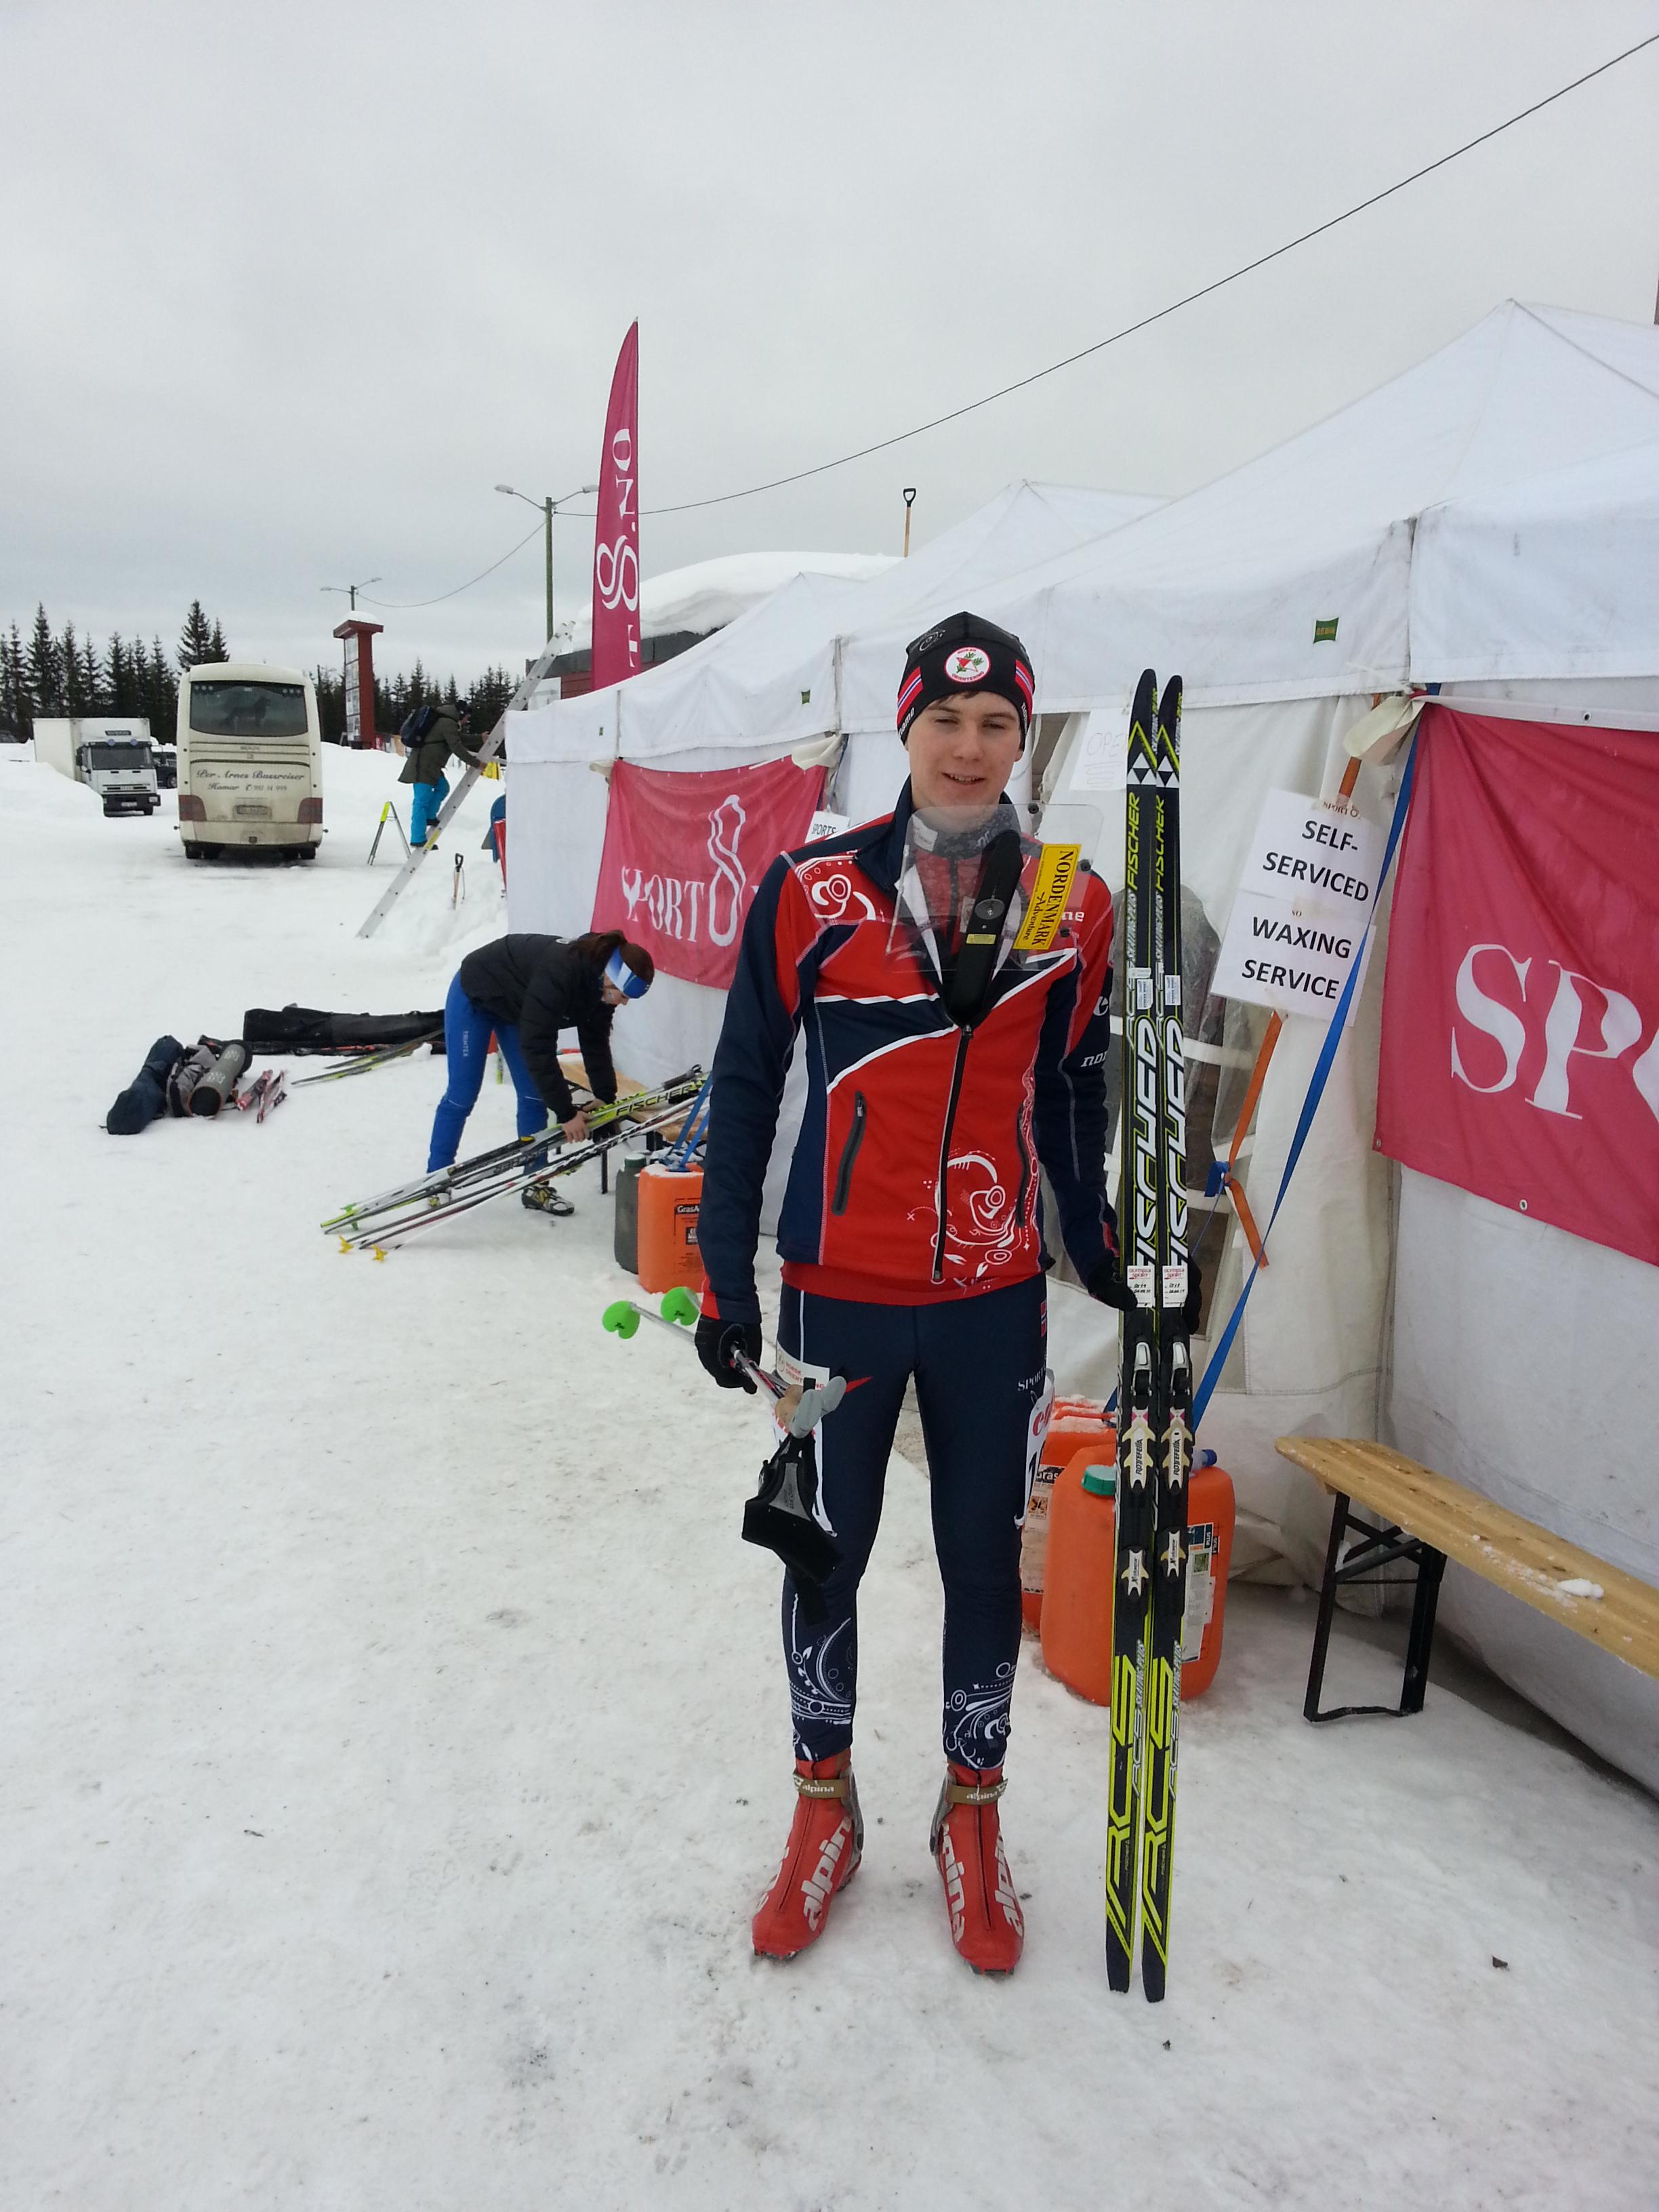 God innsats av Hallvard i ungdoms-ski-o-EM